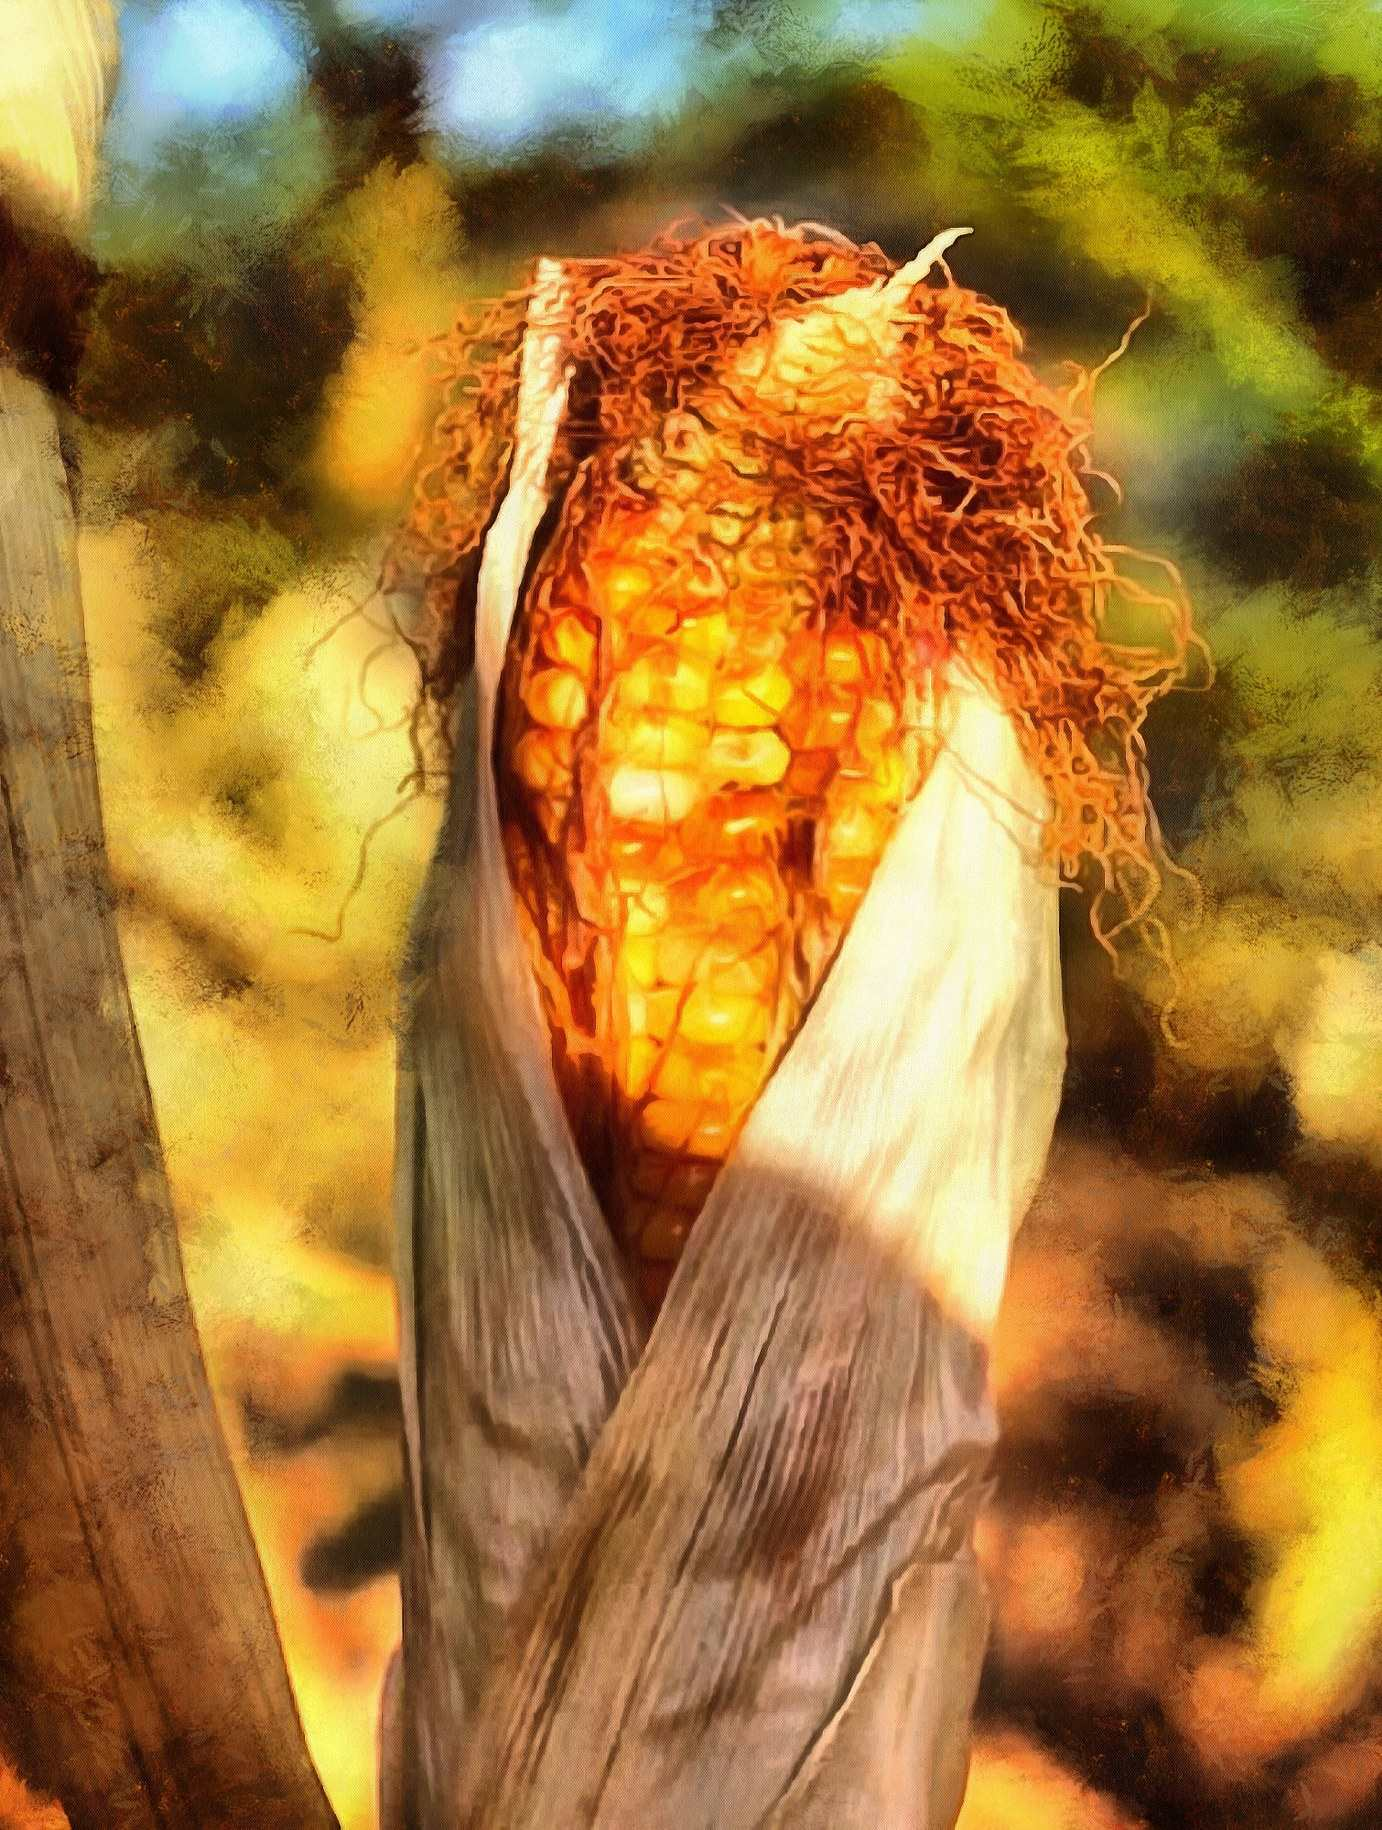 <br><br>Corn on the field, corn on the cob, corn cobs, corn seeds,